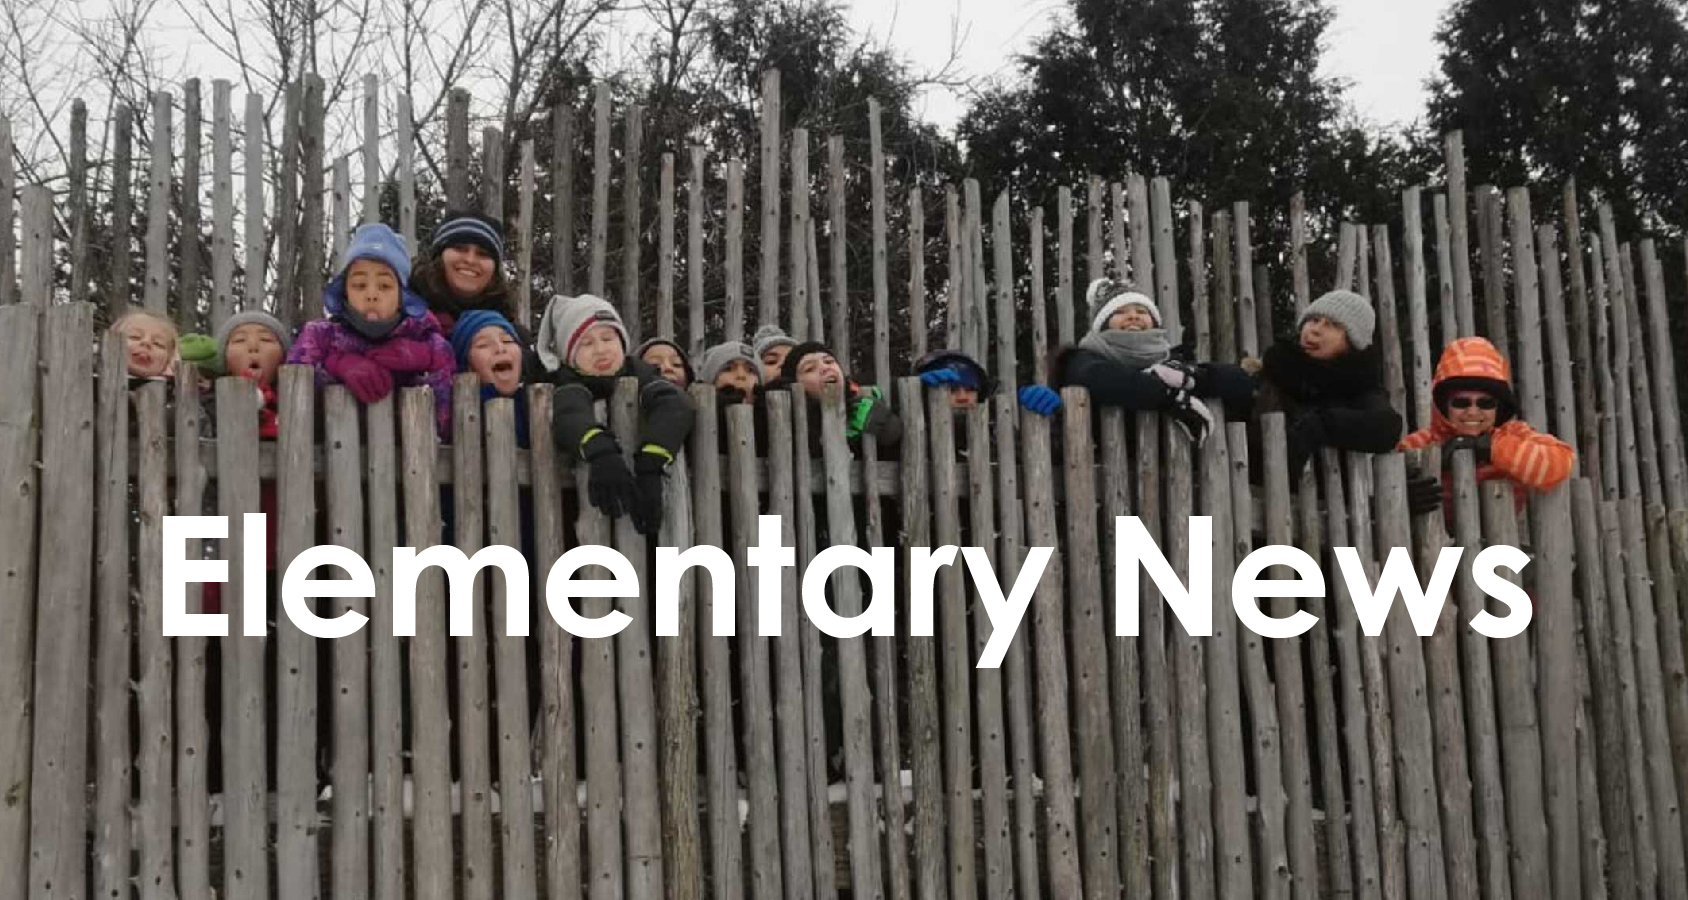 elementary news-01-01-01.jpg